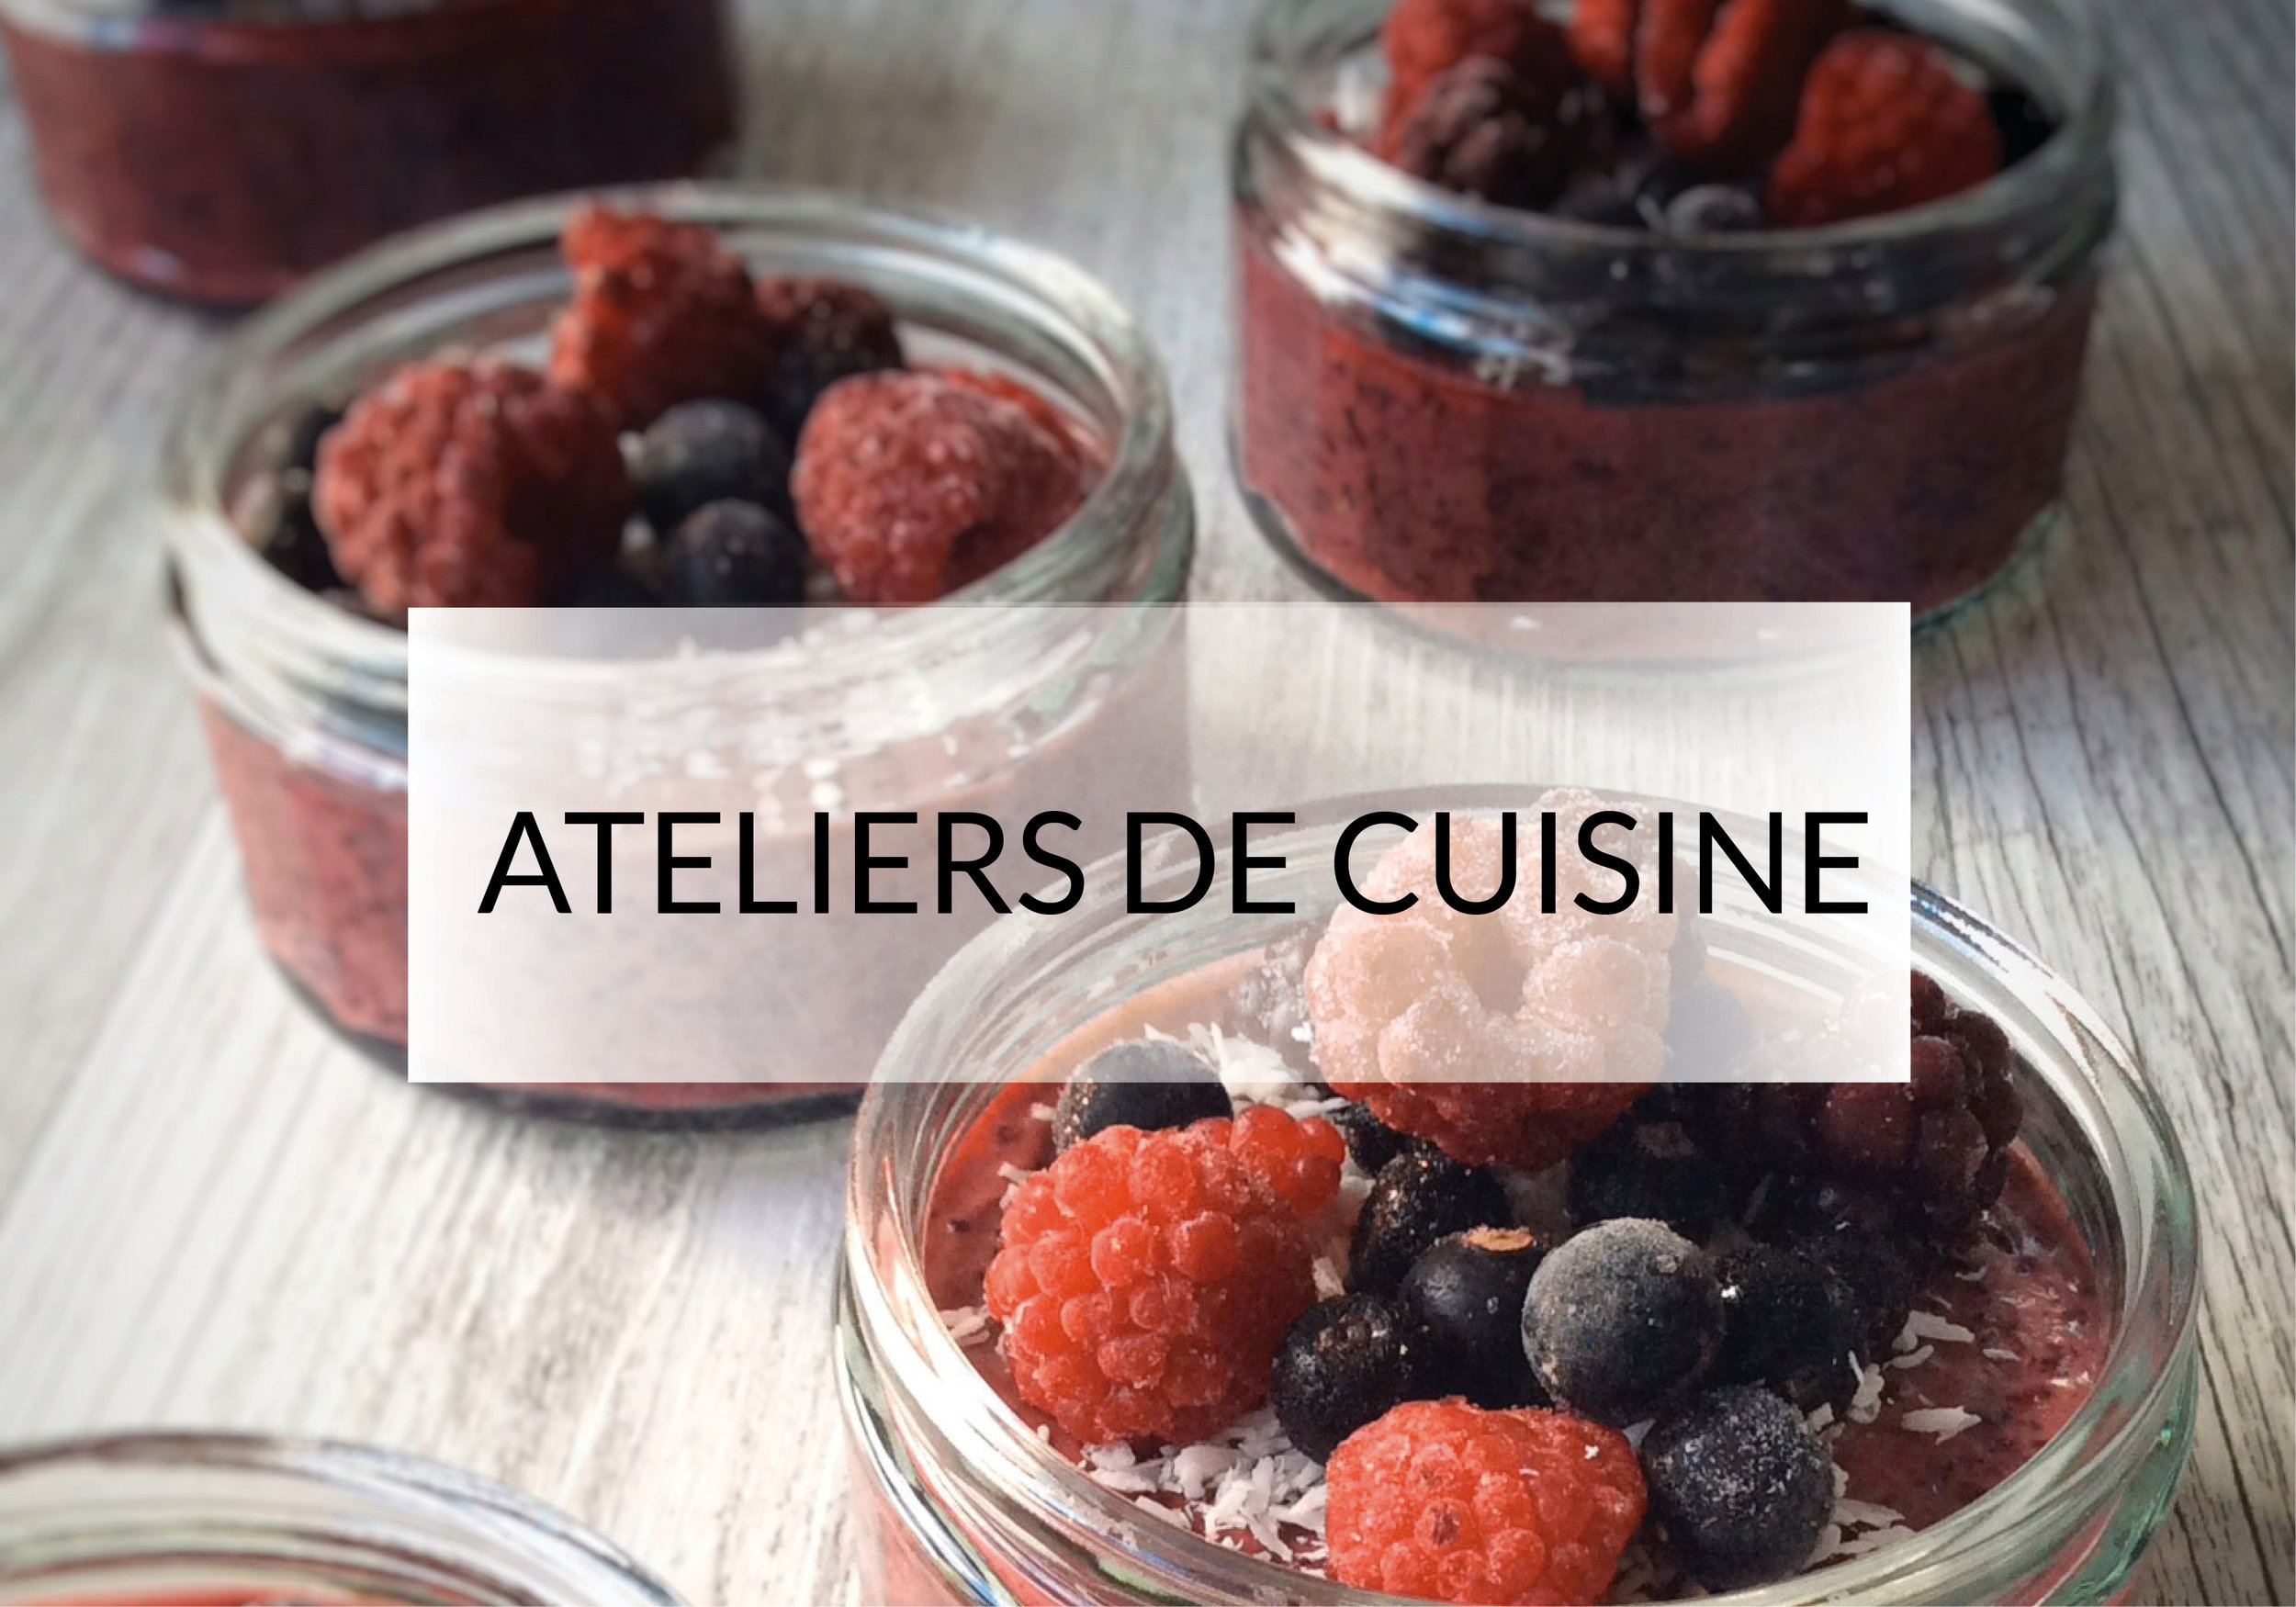 atelier-cuisine-ayurvedique-vegetarienne-vegan-paris.jpg